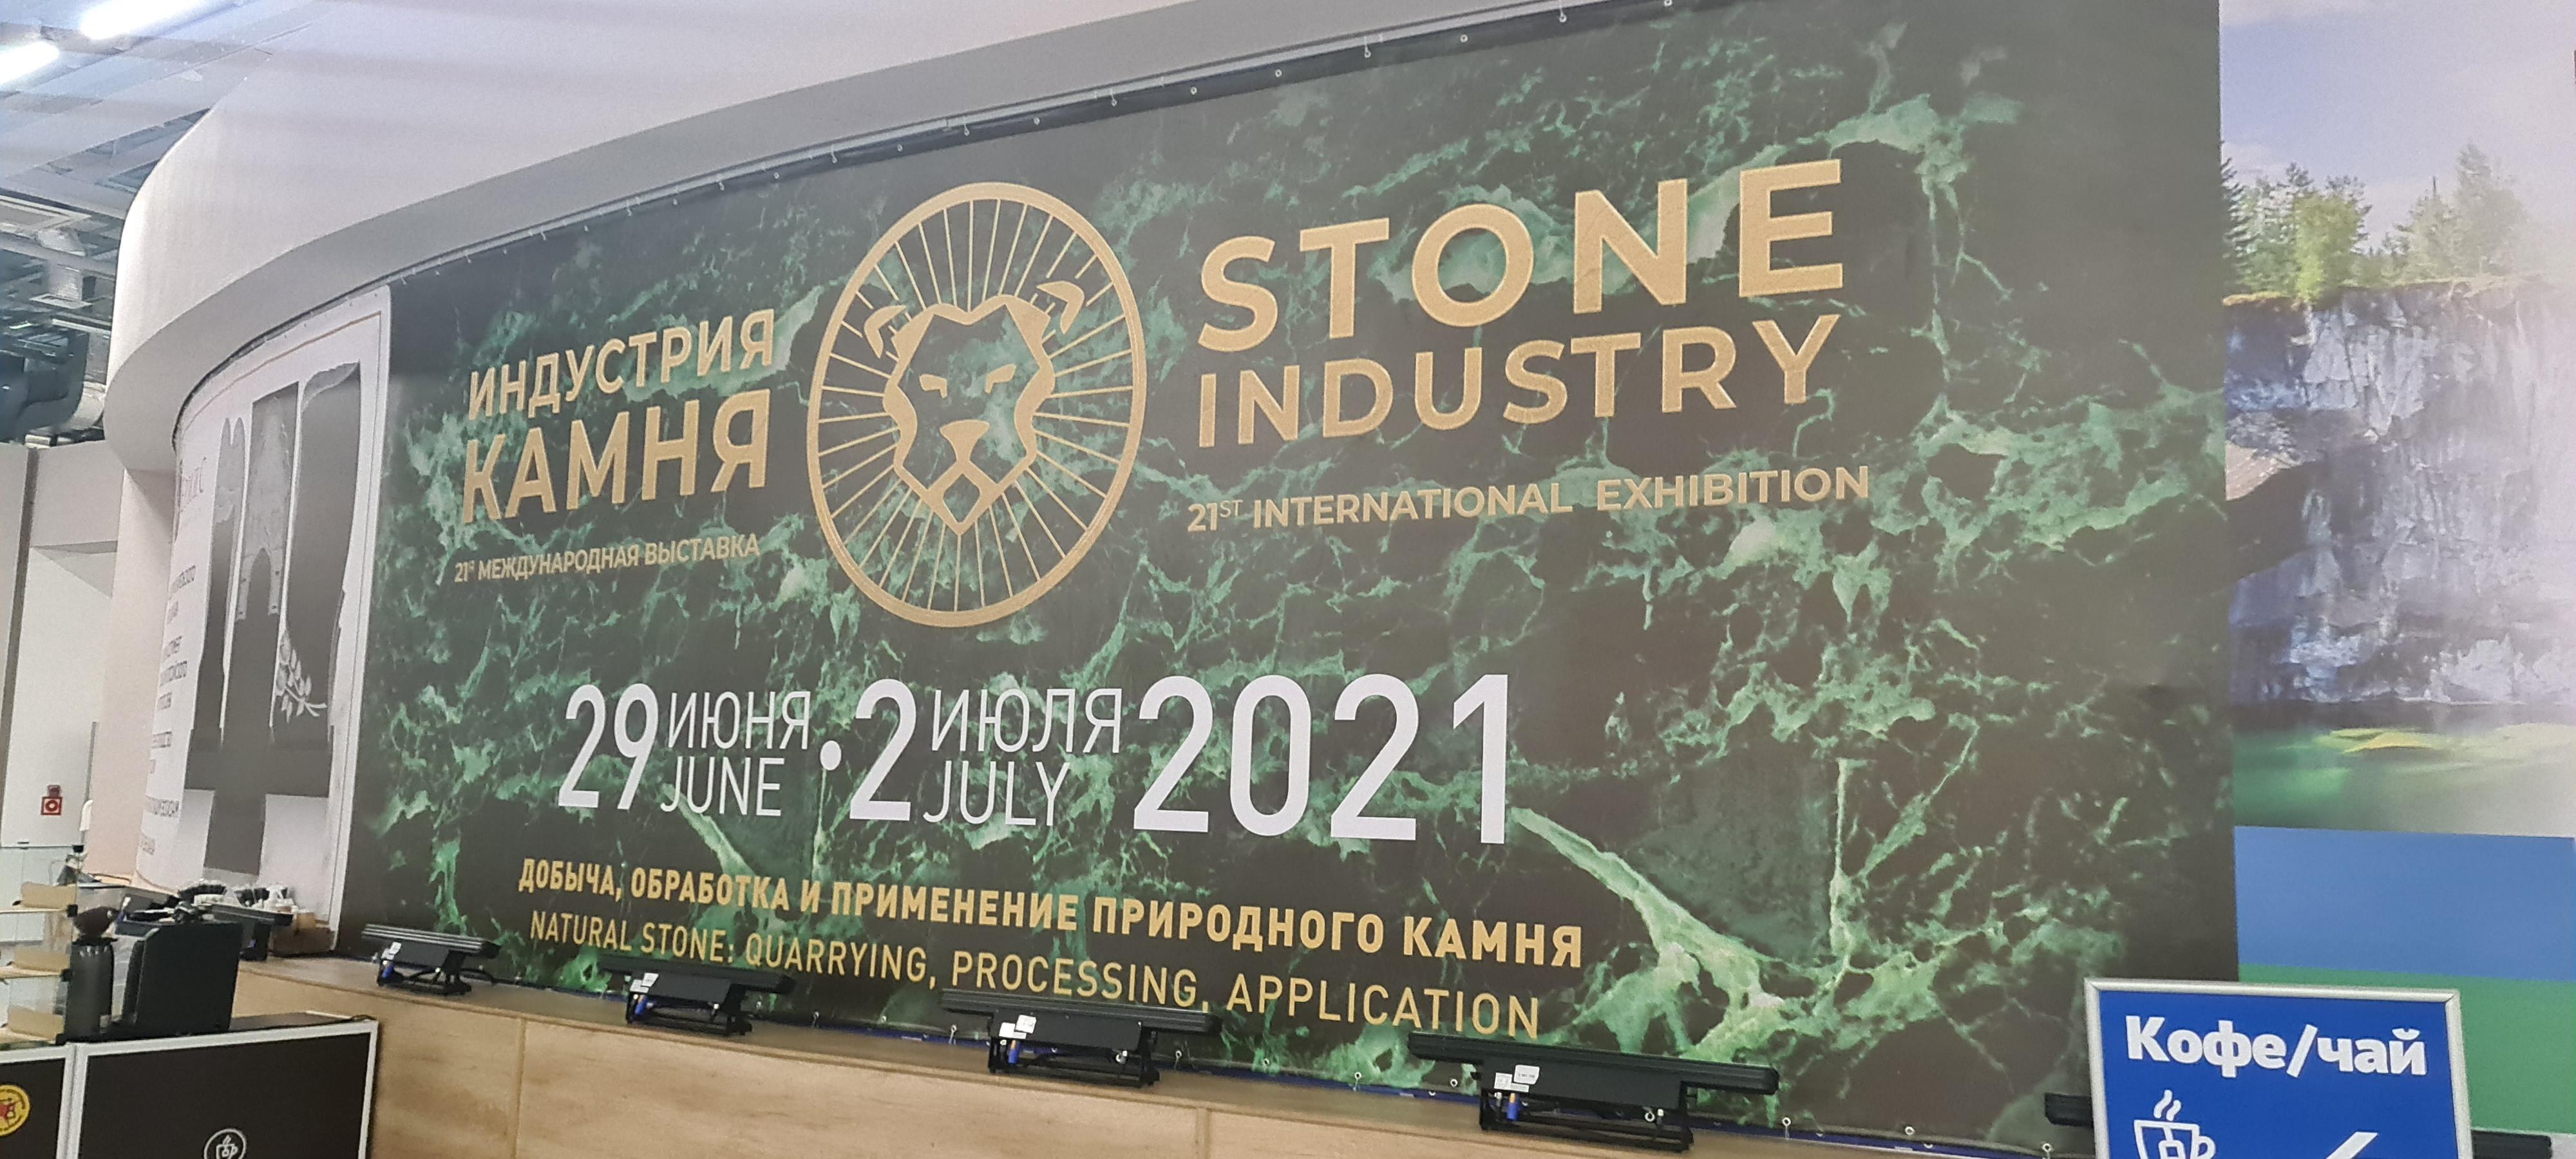 21-я международная выставка «ИНДУСТРИЯ КАМНЯ» на ВДНХ